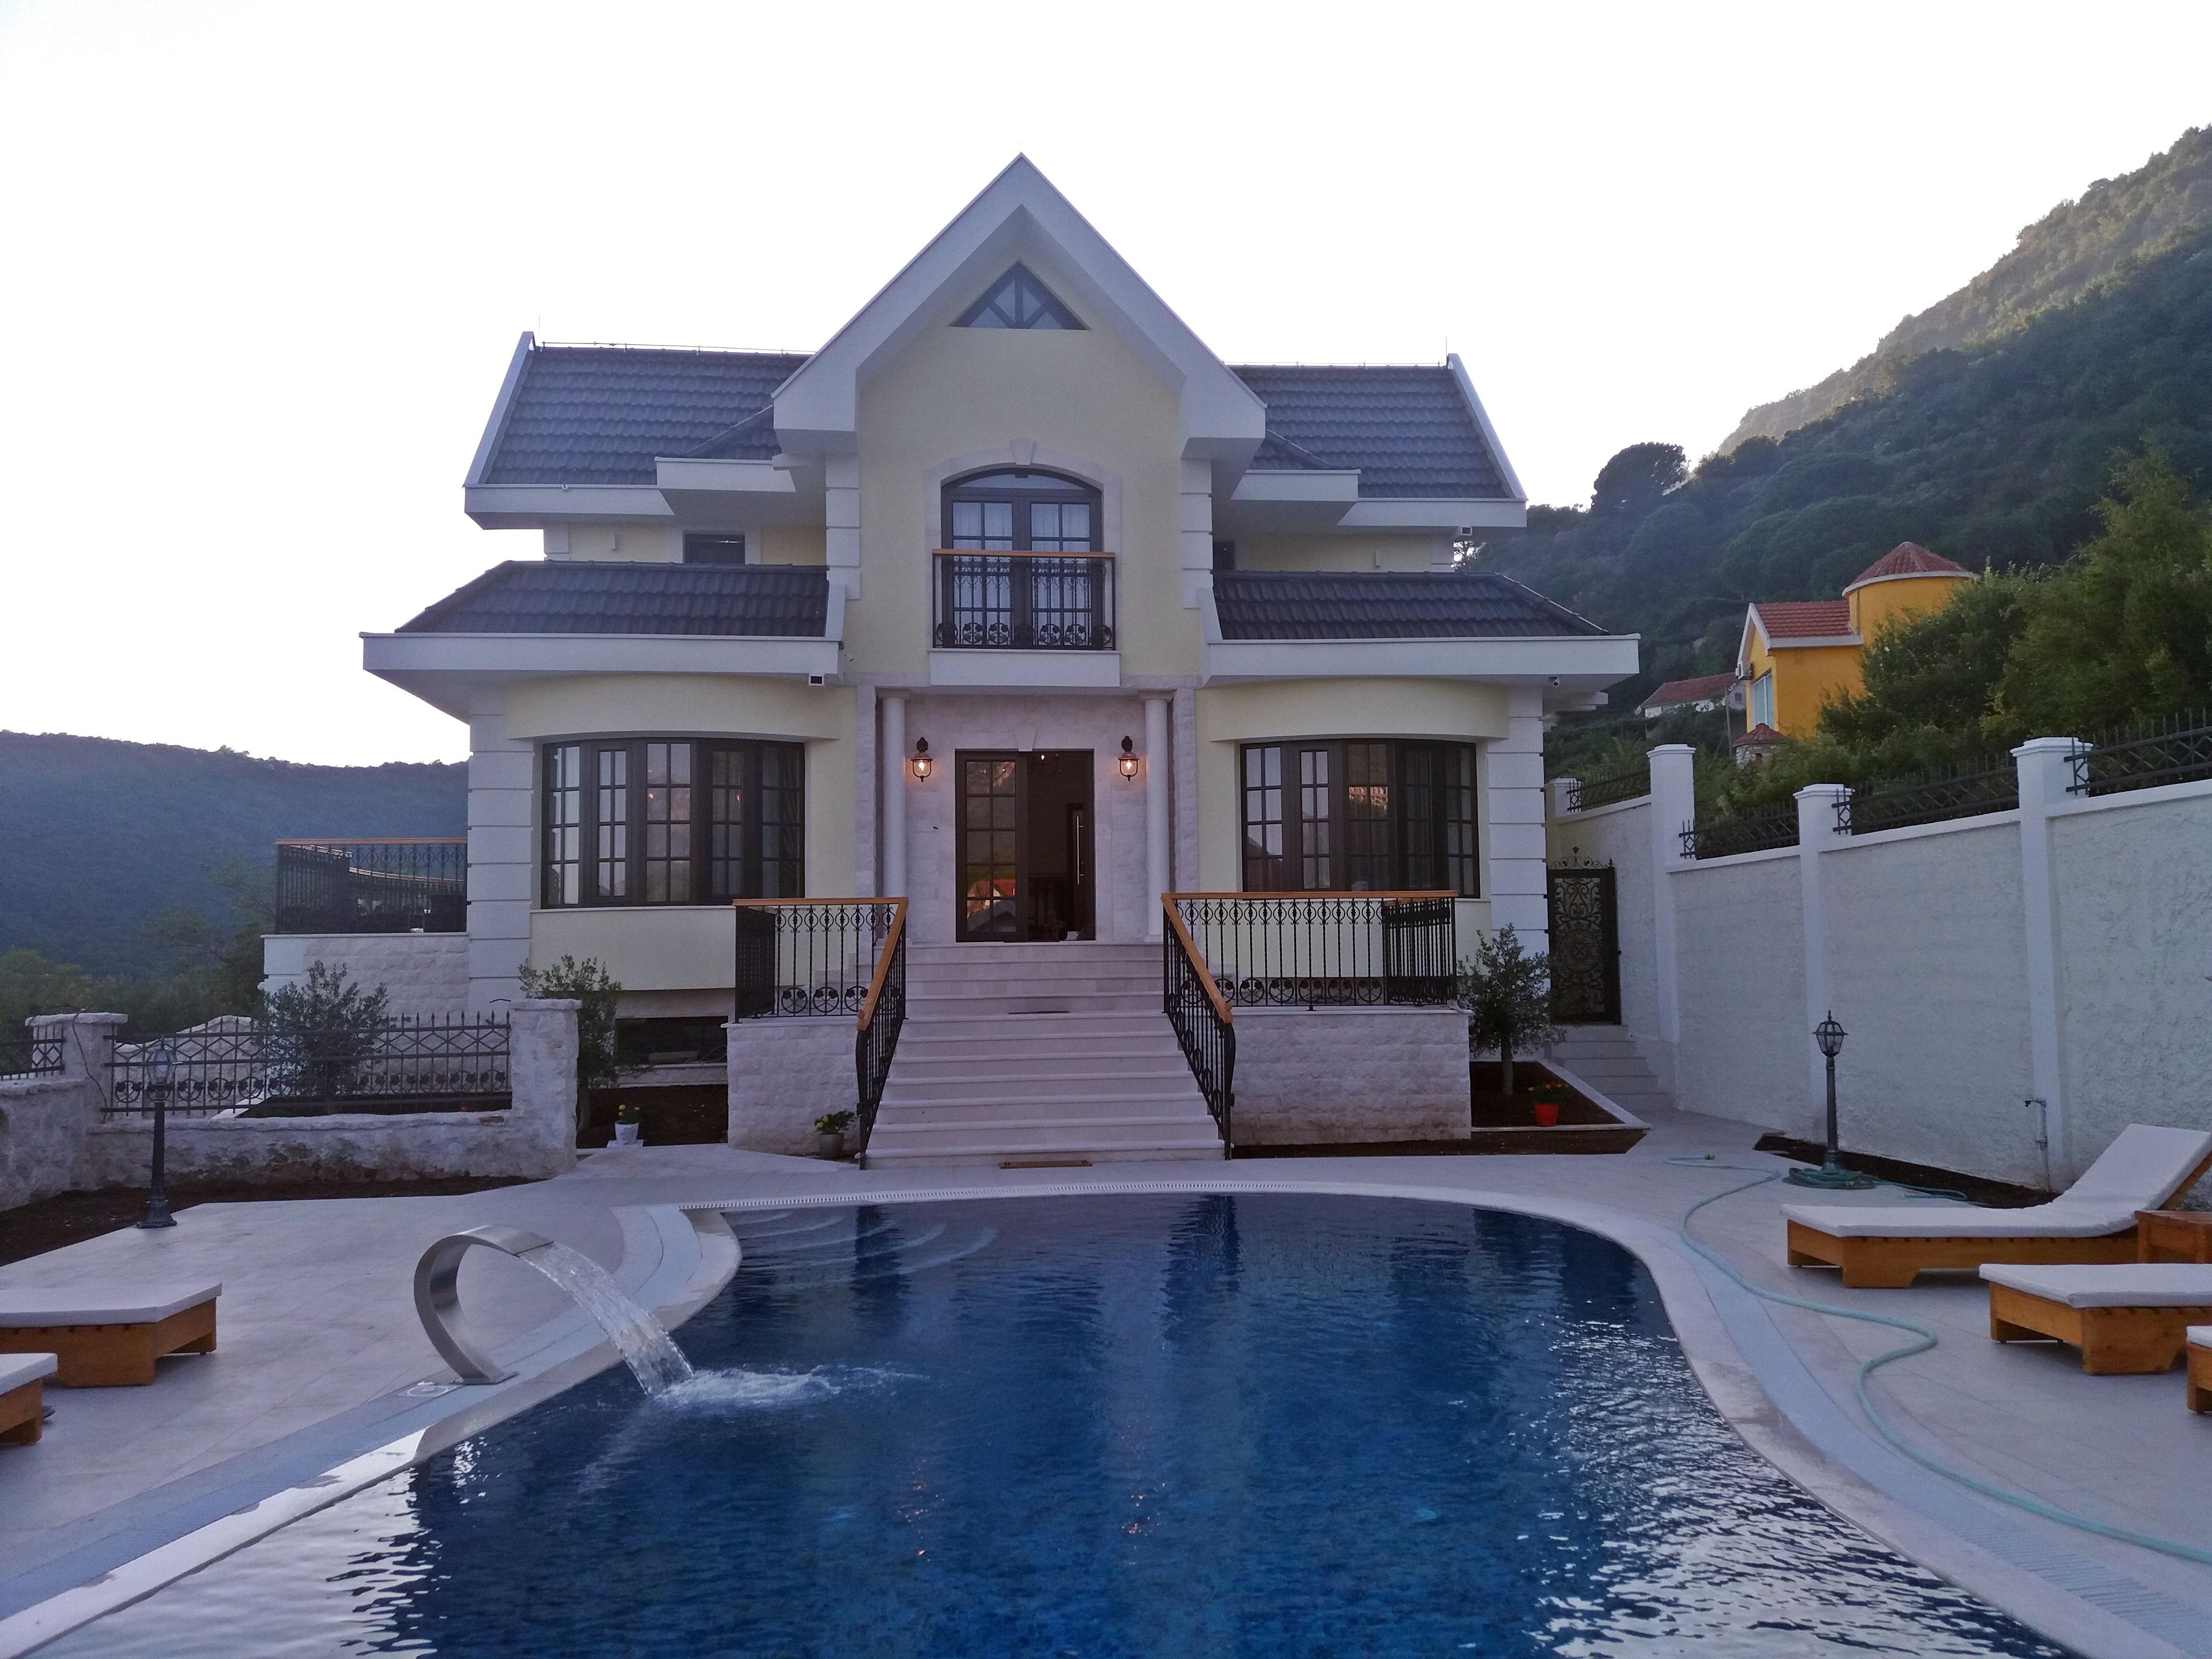 NewLine Montenegro - LUXURY villa with swimming pool - Vila Panorama